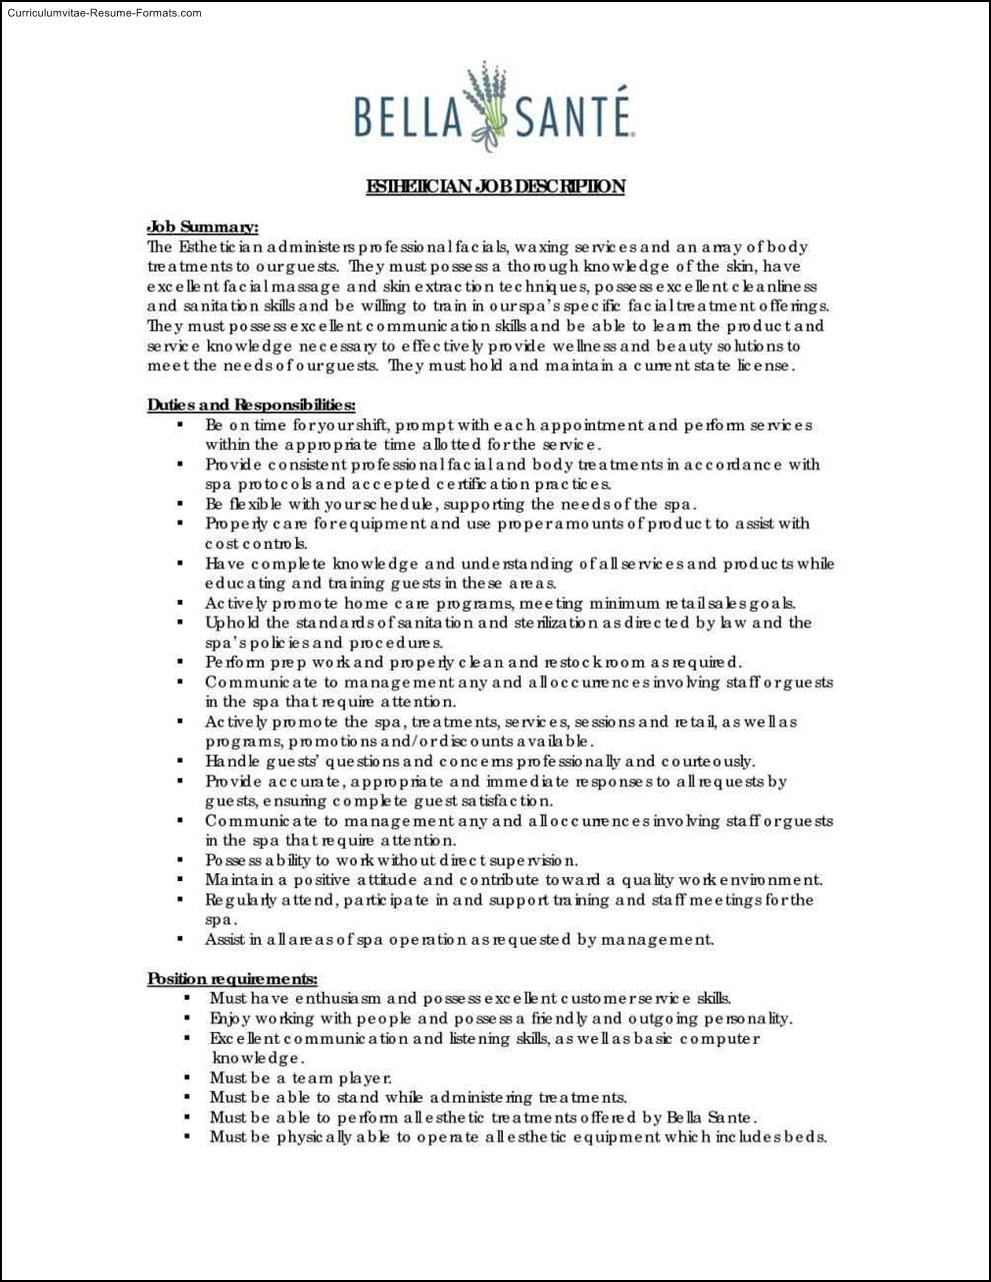 esthetician resume templates